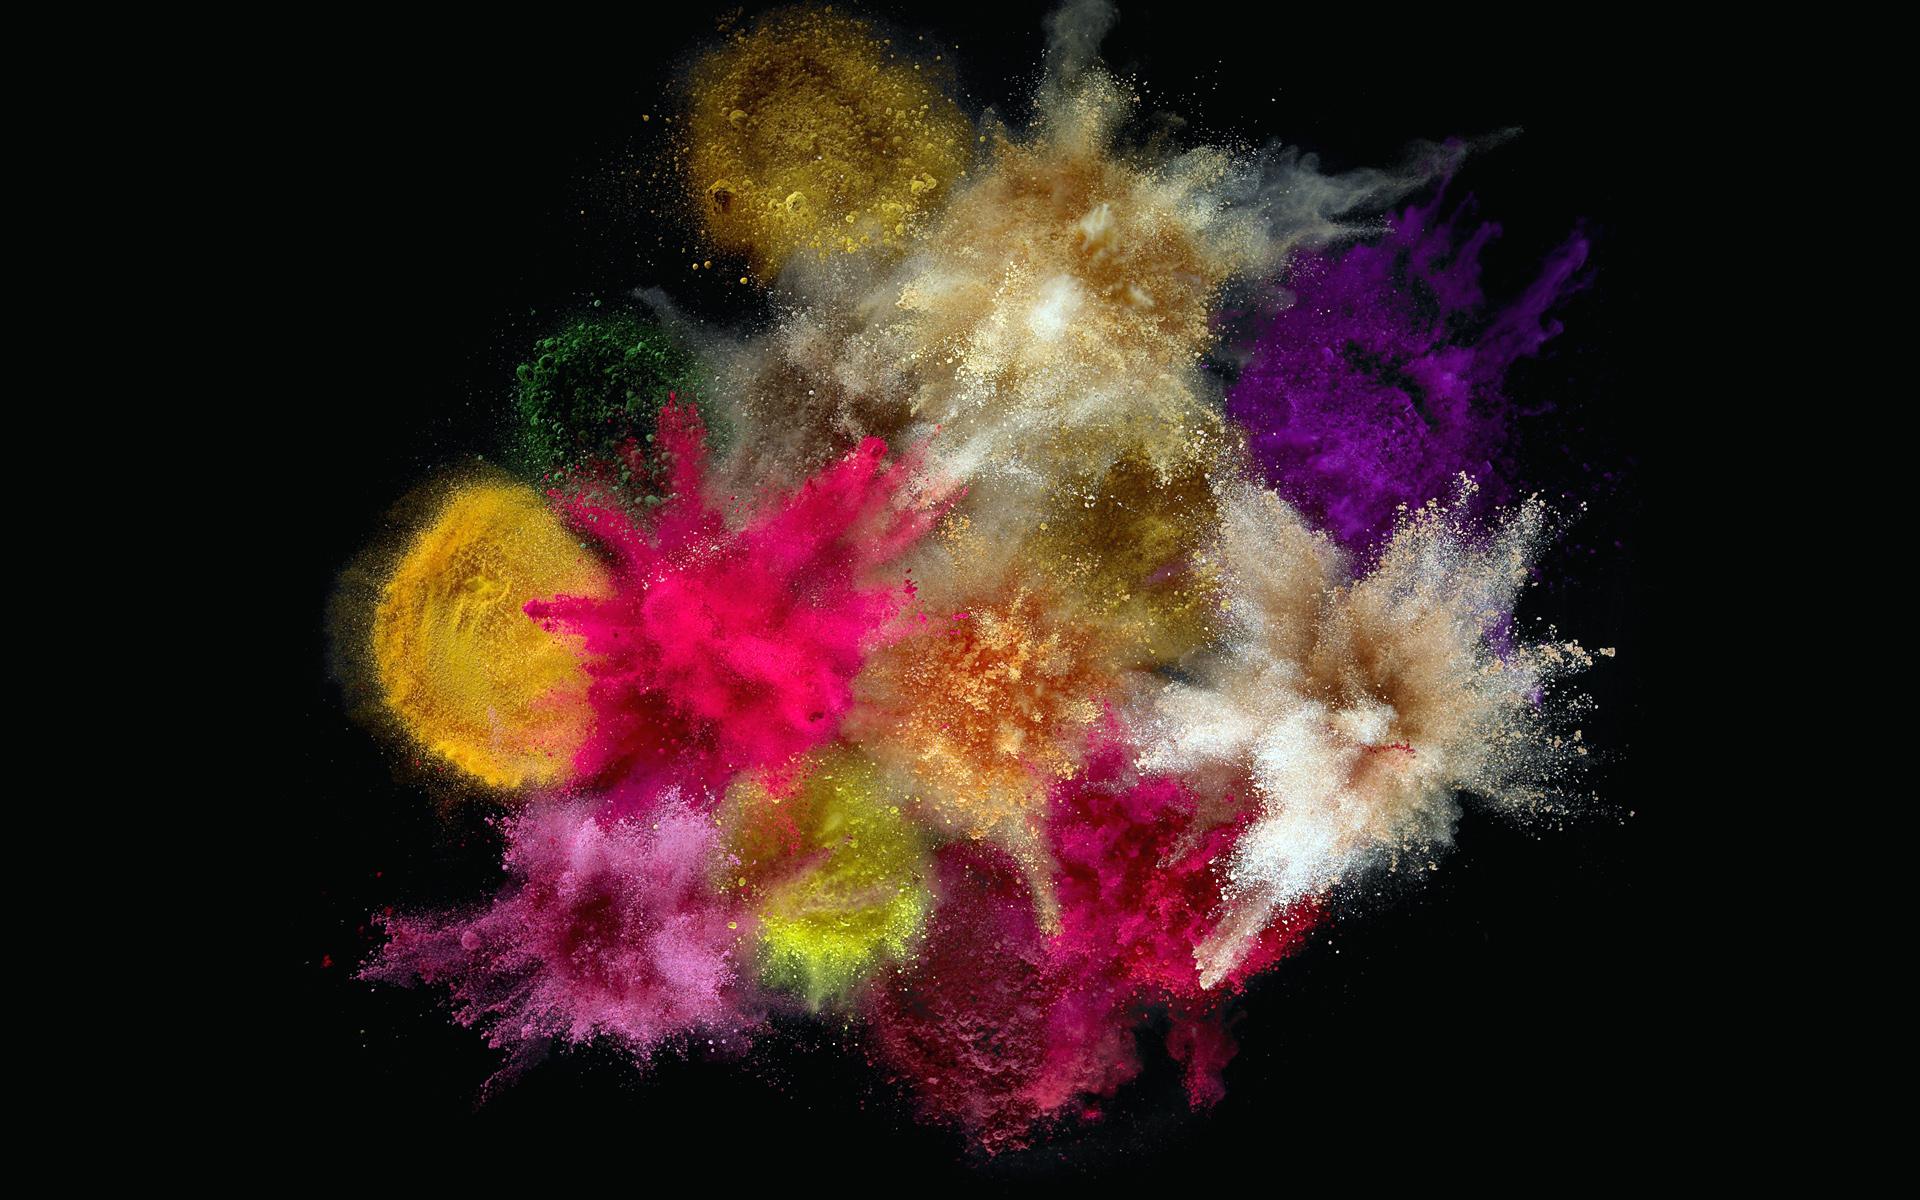 Close-up of colorful powder splashing against black background